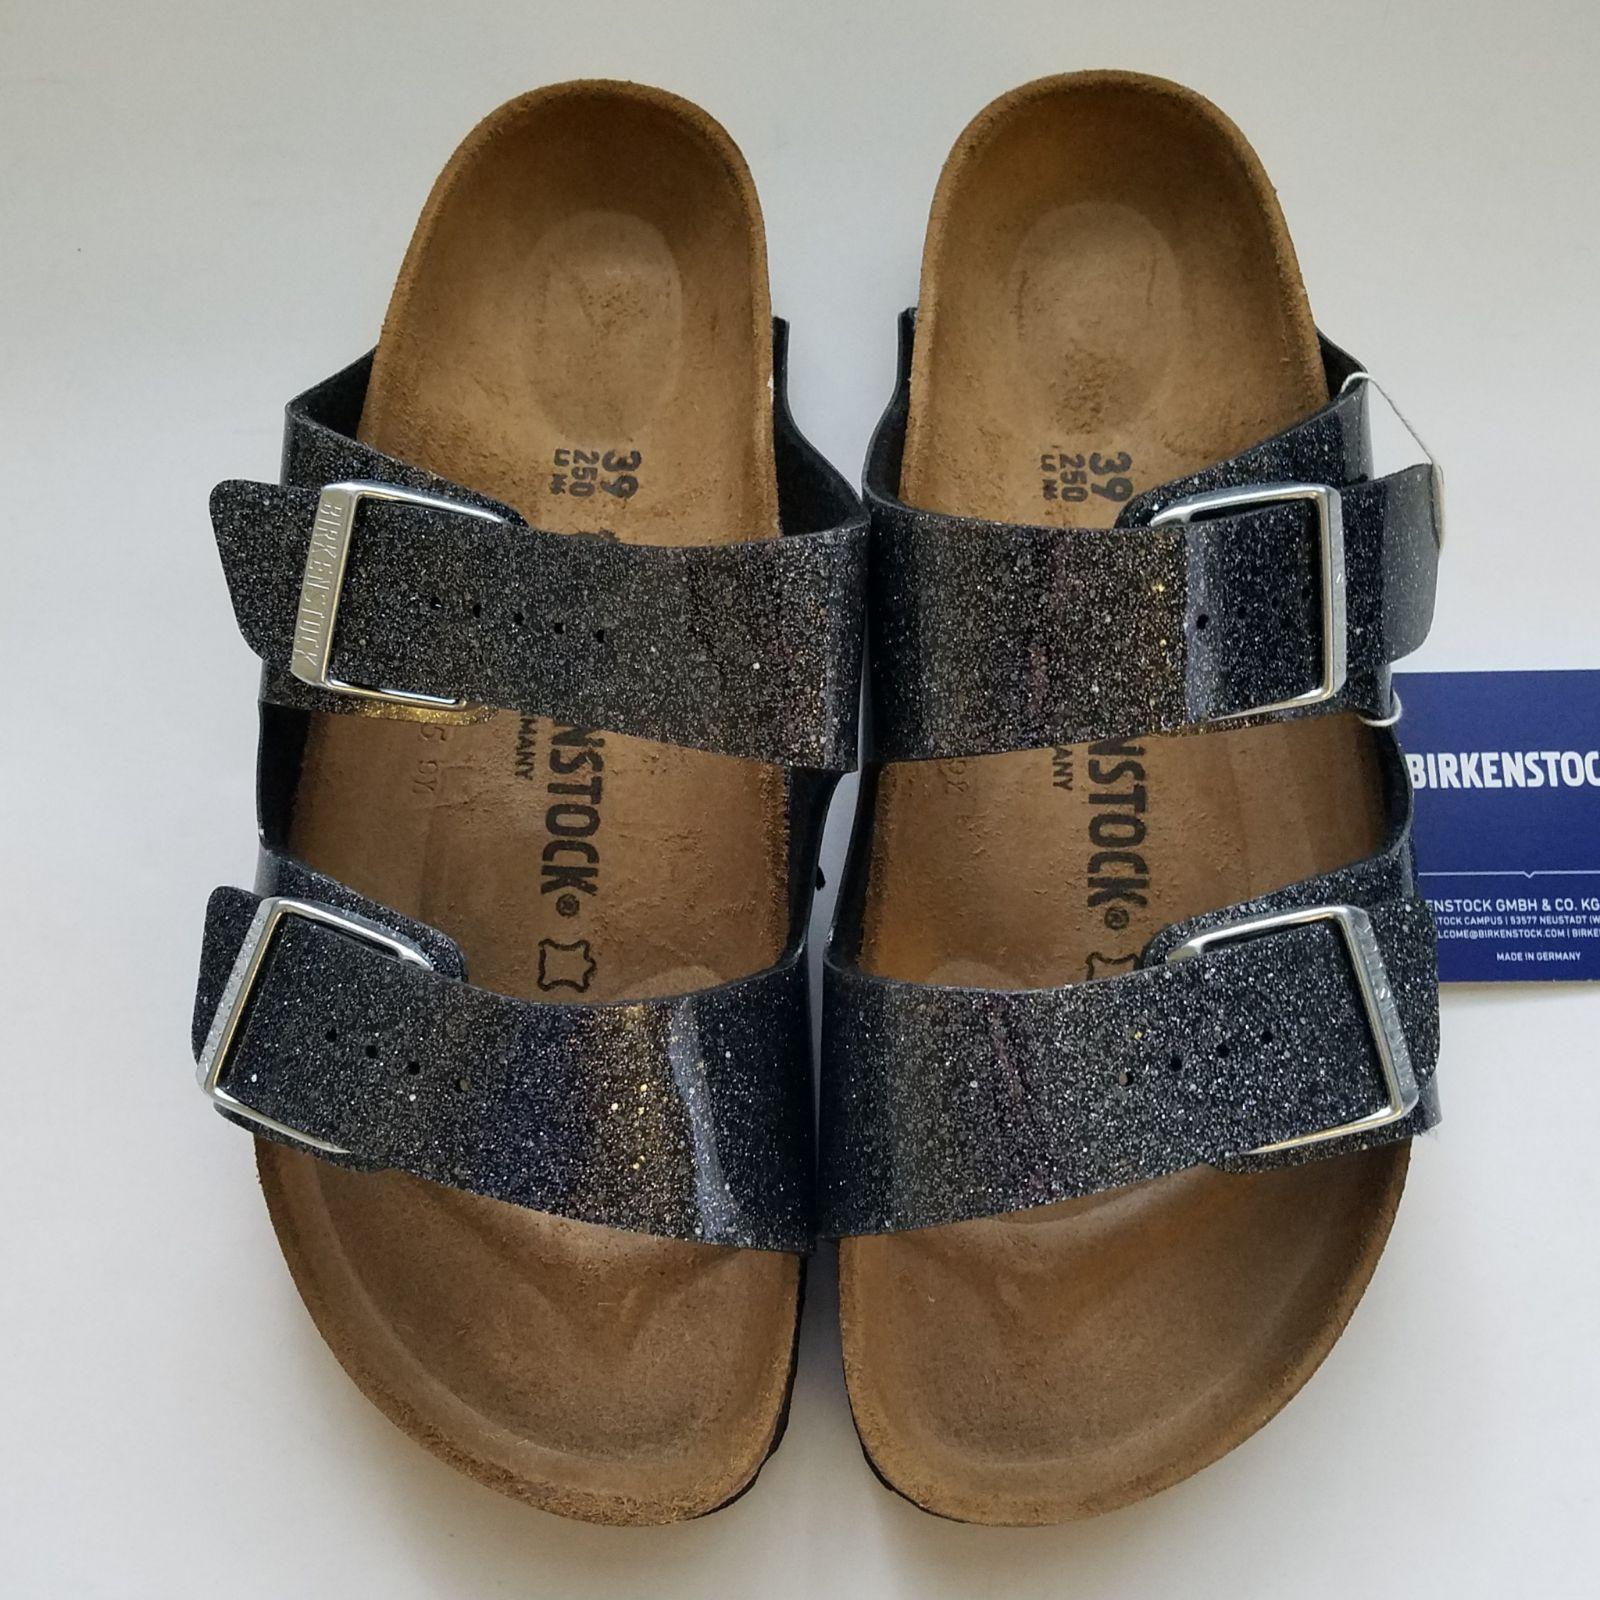 New Birkenstock Arizona Cosmic Sparkle Anthracite Sandals Size 39 Narrow Birkenstock Birkenstock Arizona Birkenstock Sandals